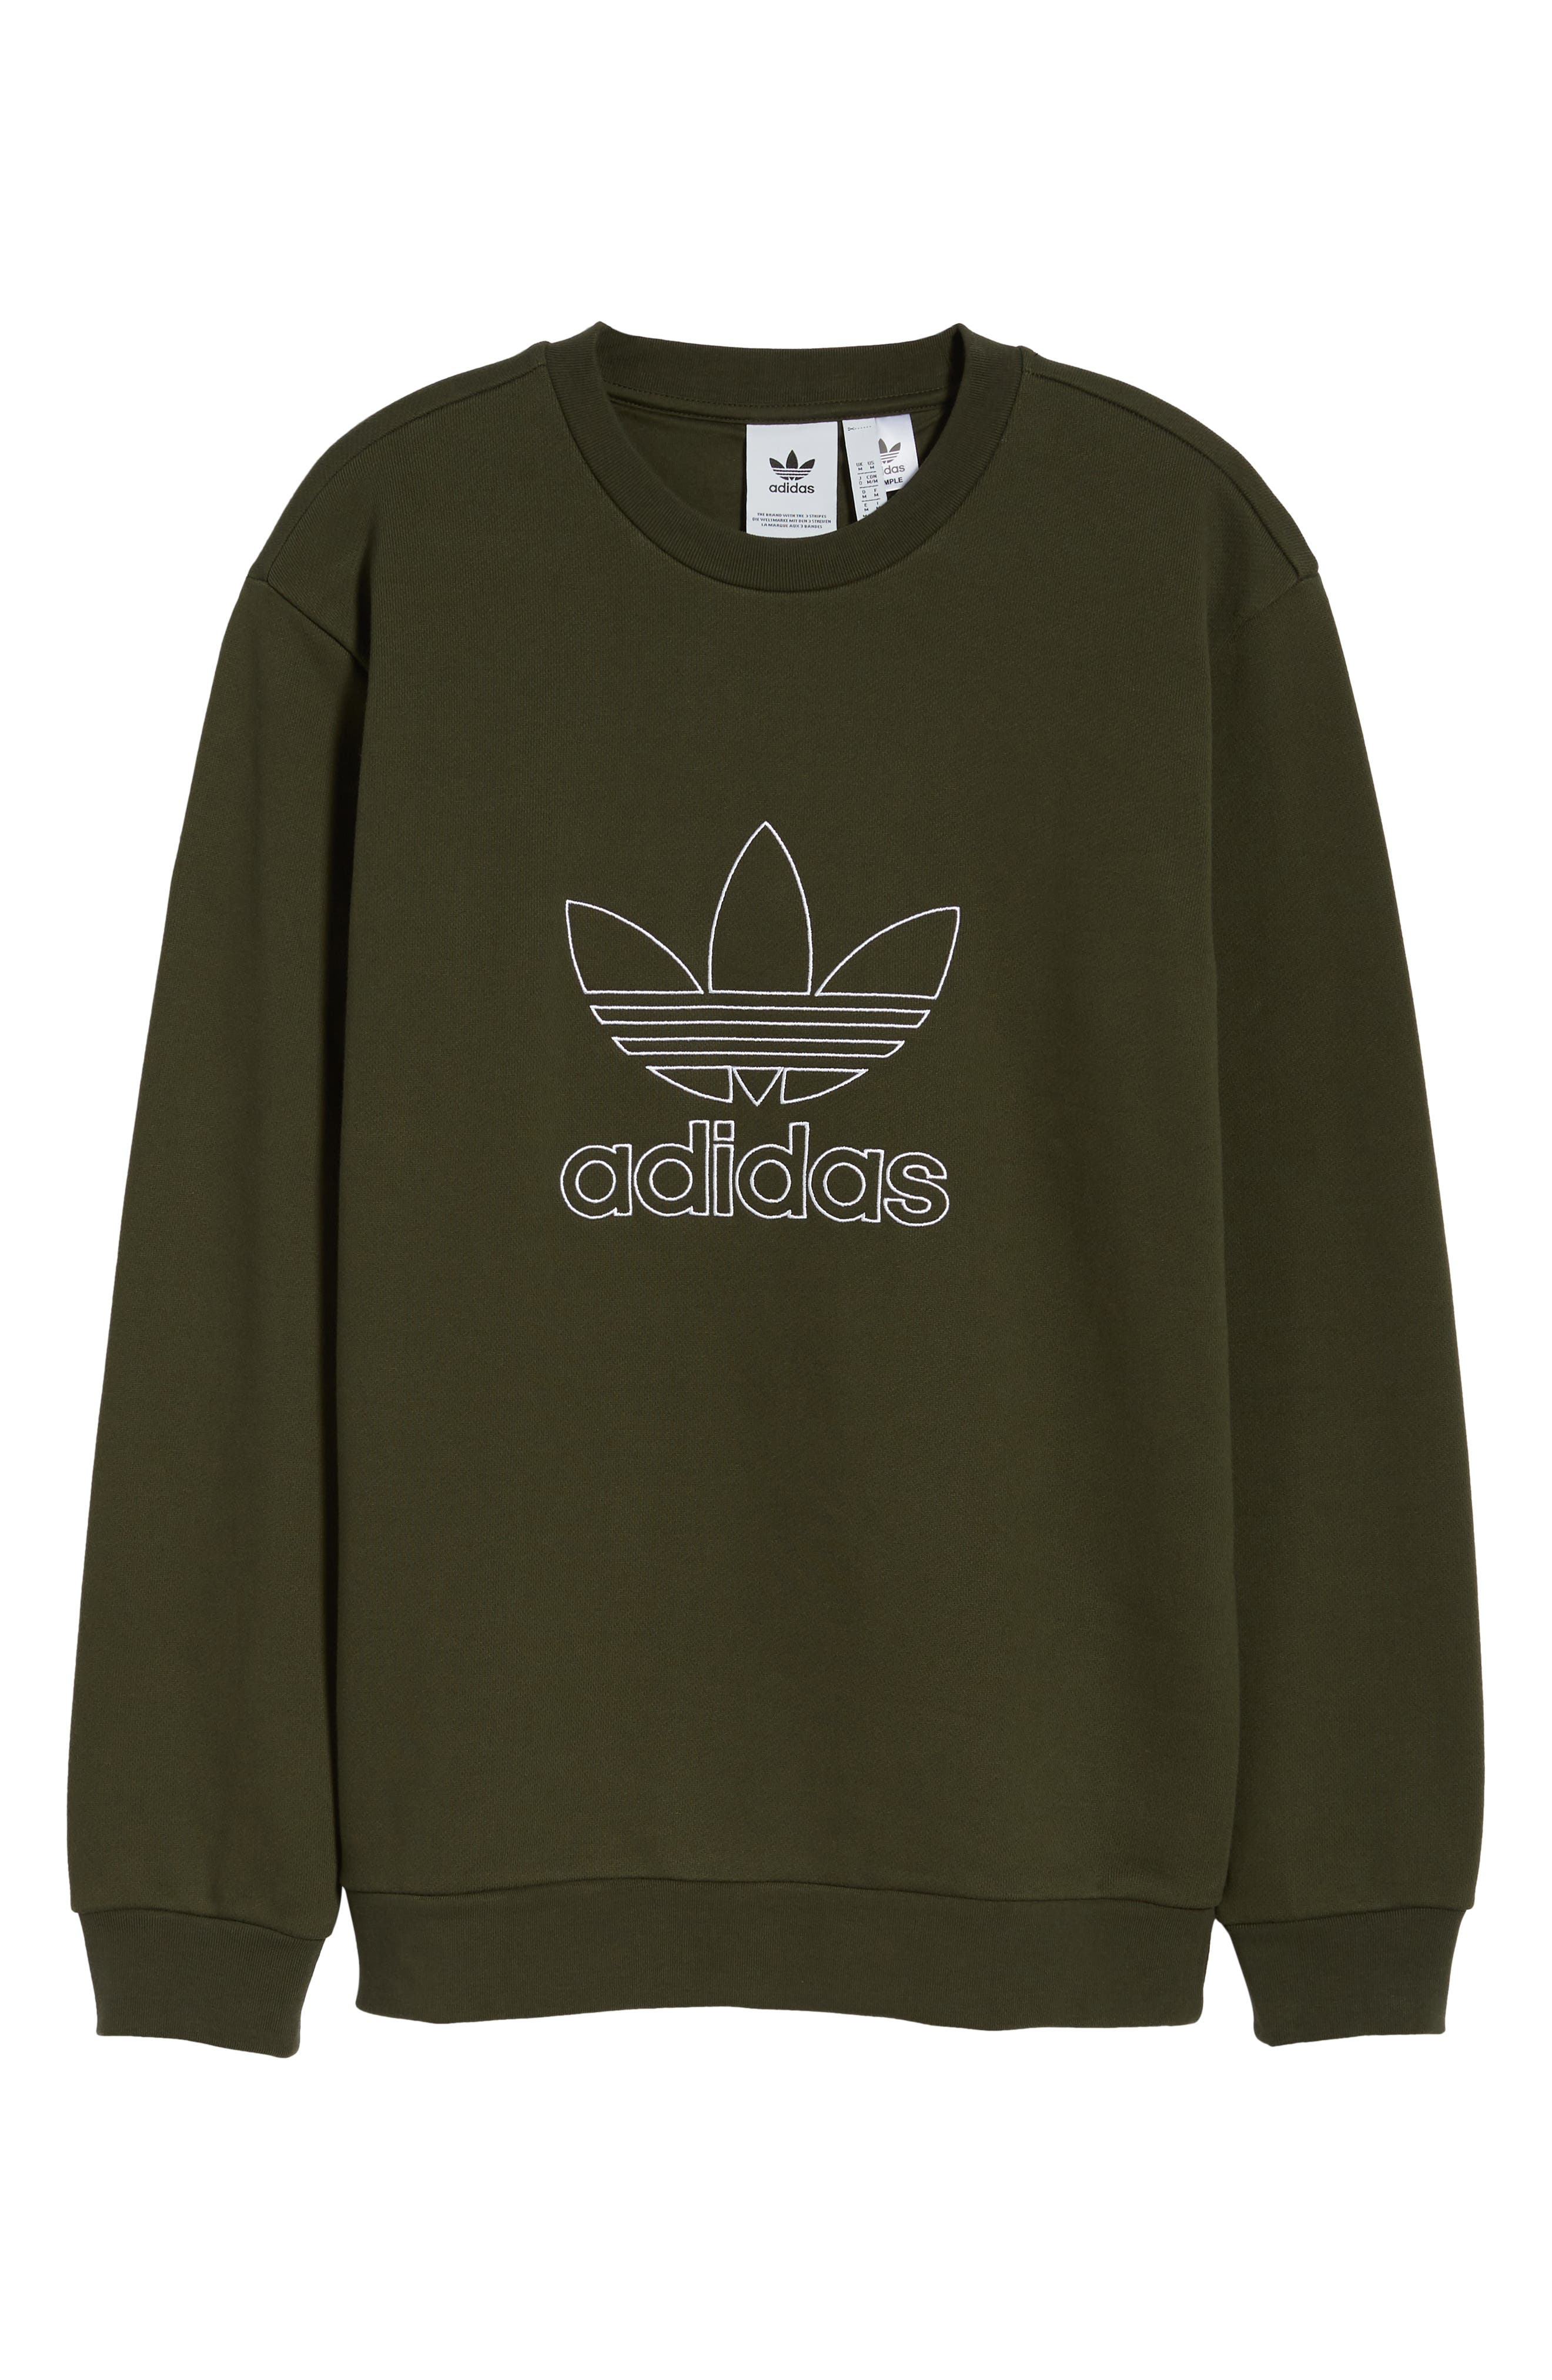 adidas Outline Trefoil Crewneck Sweatshirt,                             Alternate thumbnail 6, color,                             307